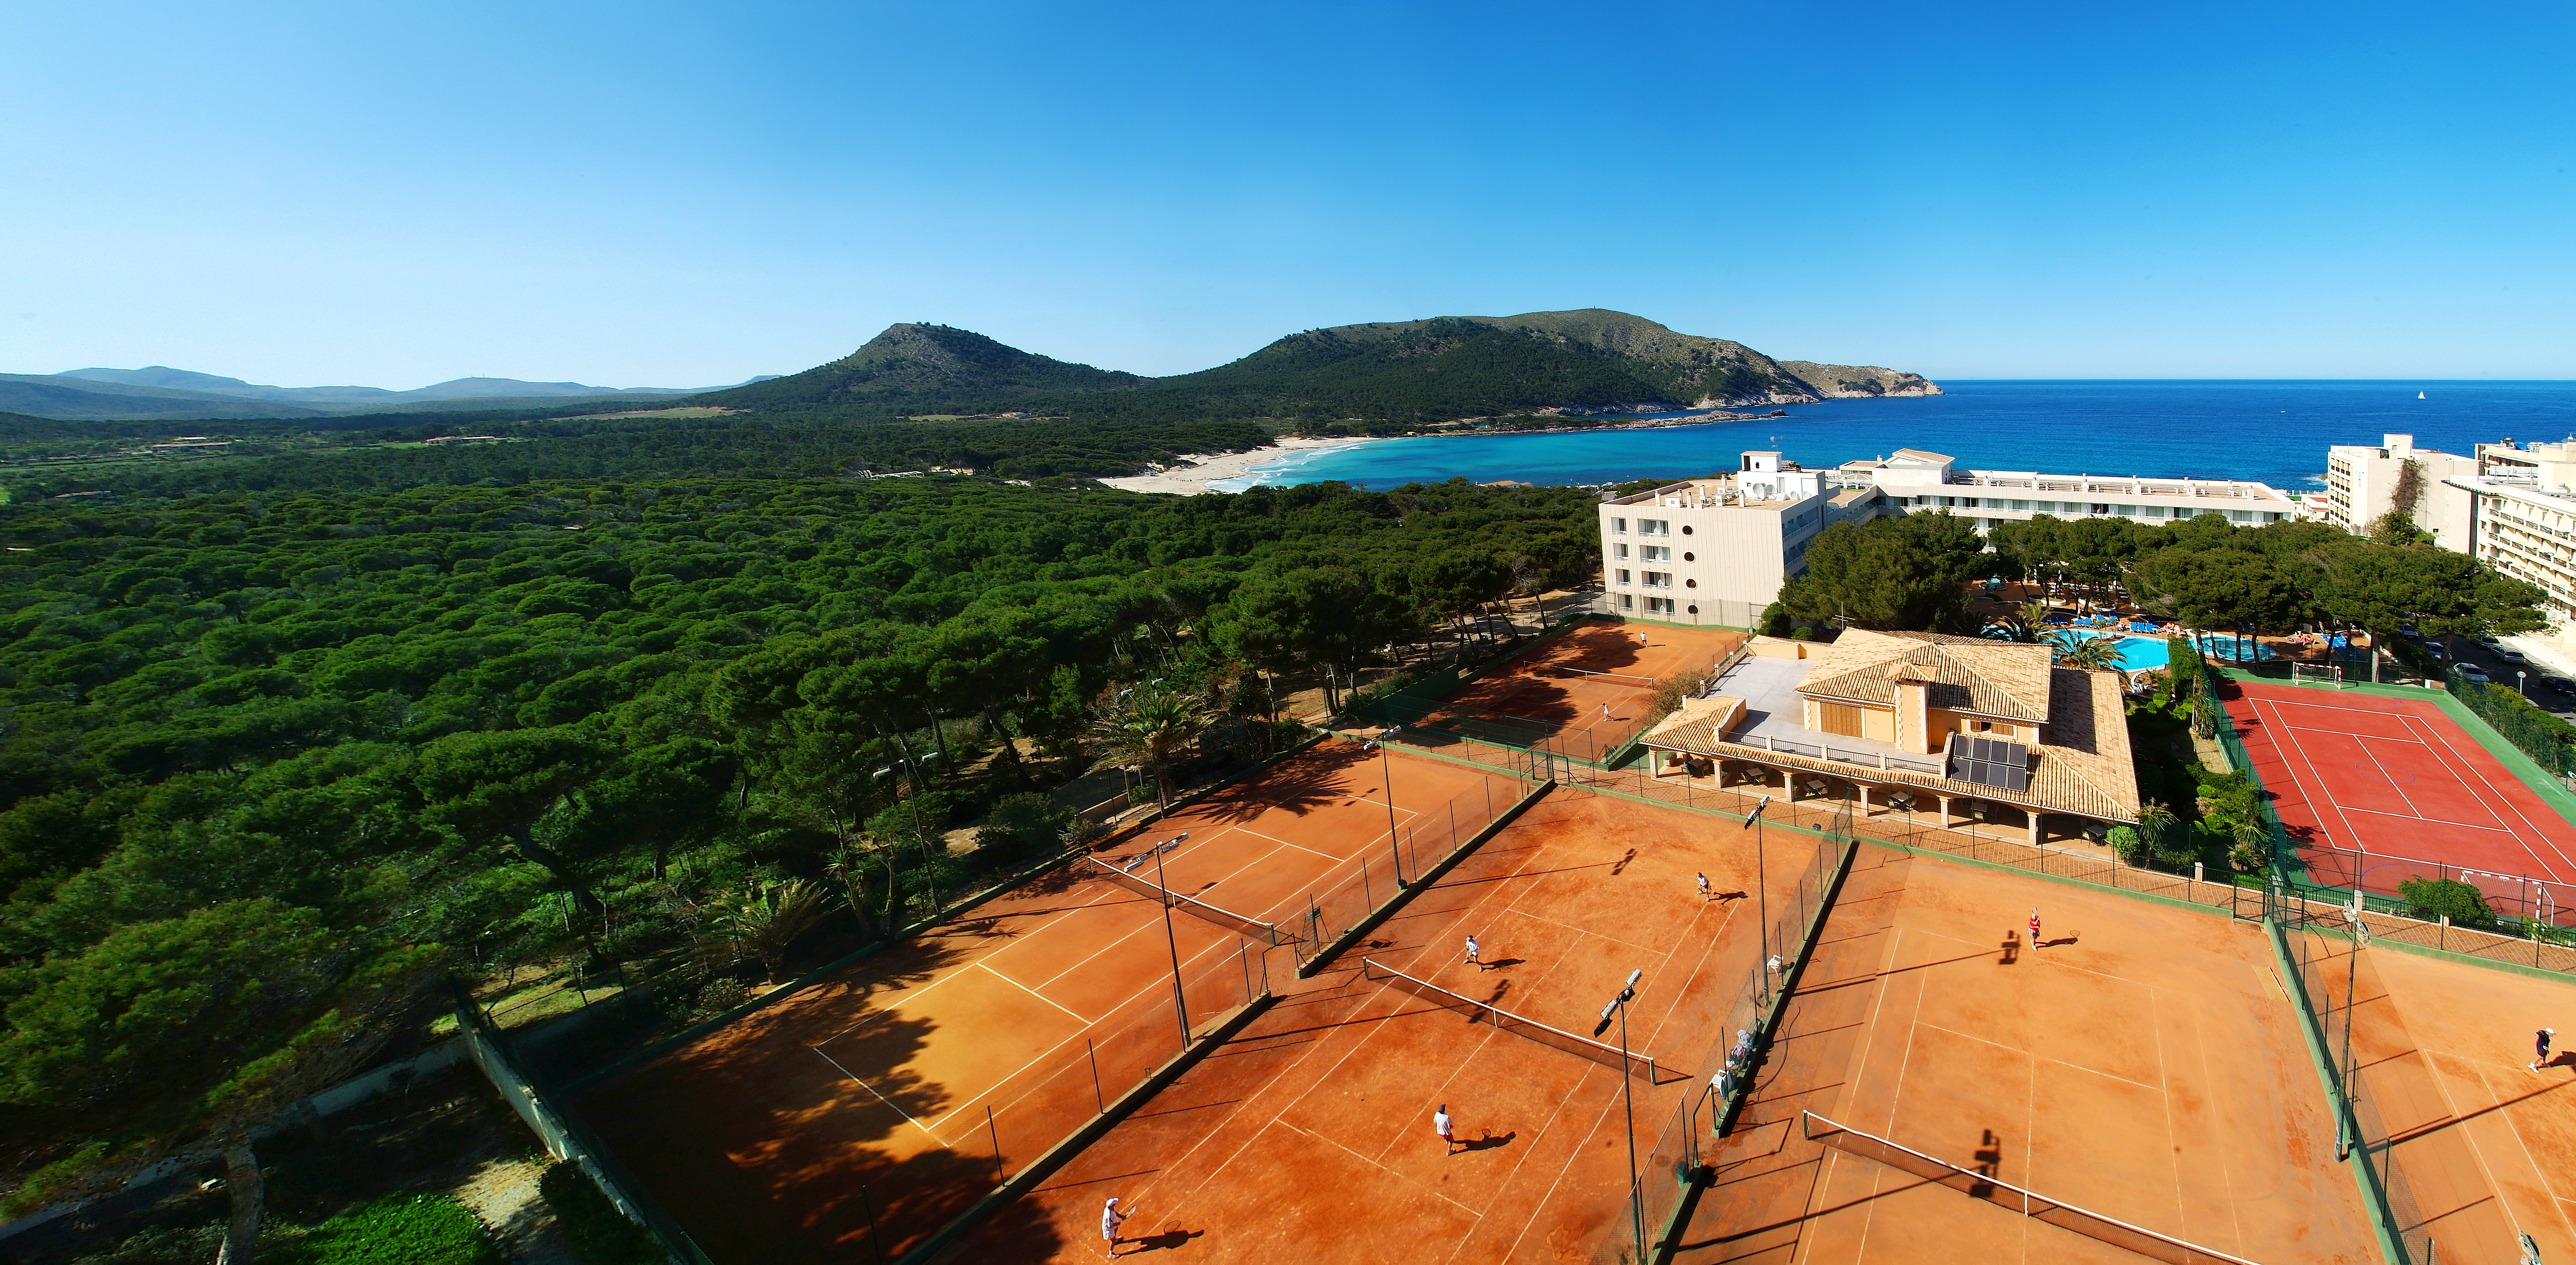 S Entrador Playa Hotel Cala Ratjada